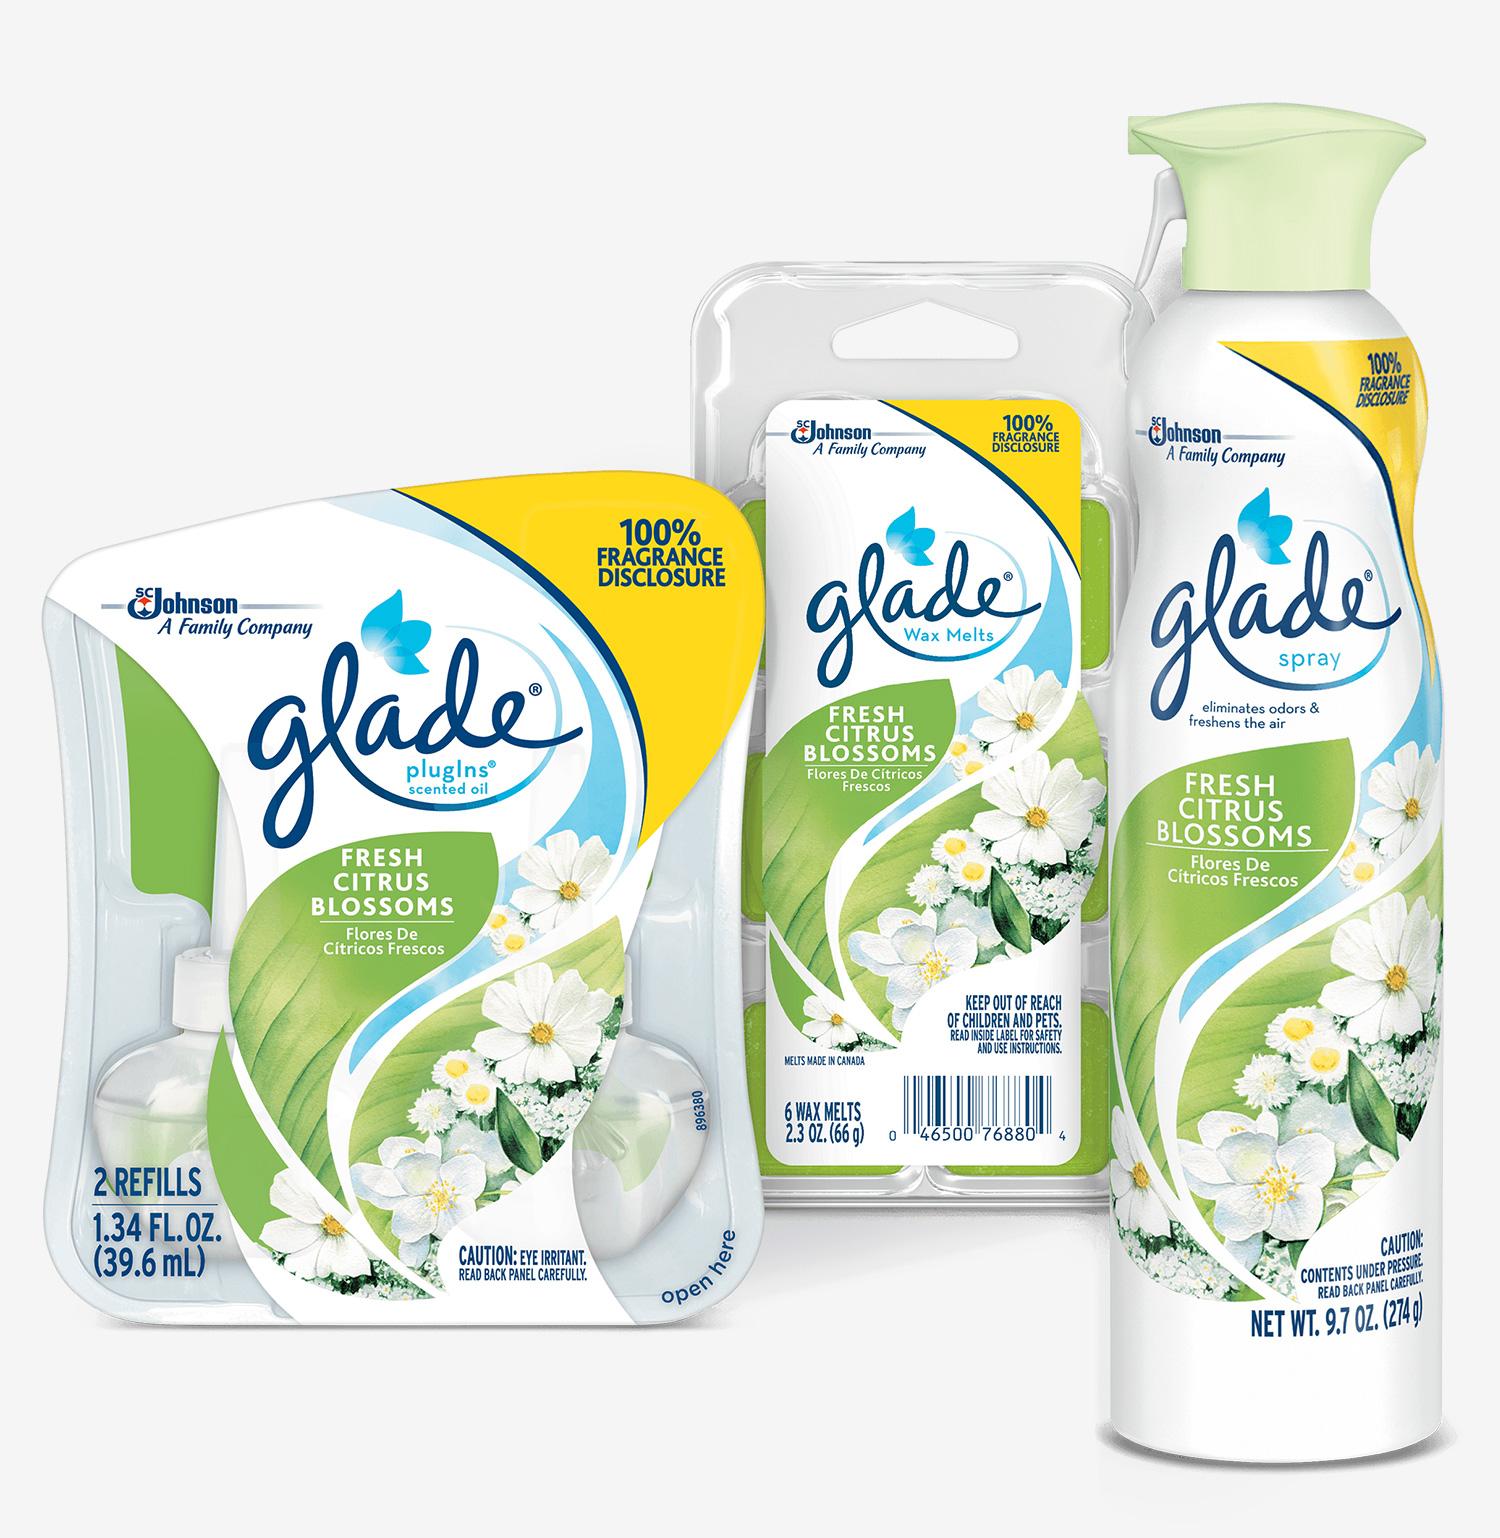 SC Johnson раскрывает информацию о составе ароматов коллекции Glade® Fresh Citrus Blossoms